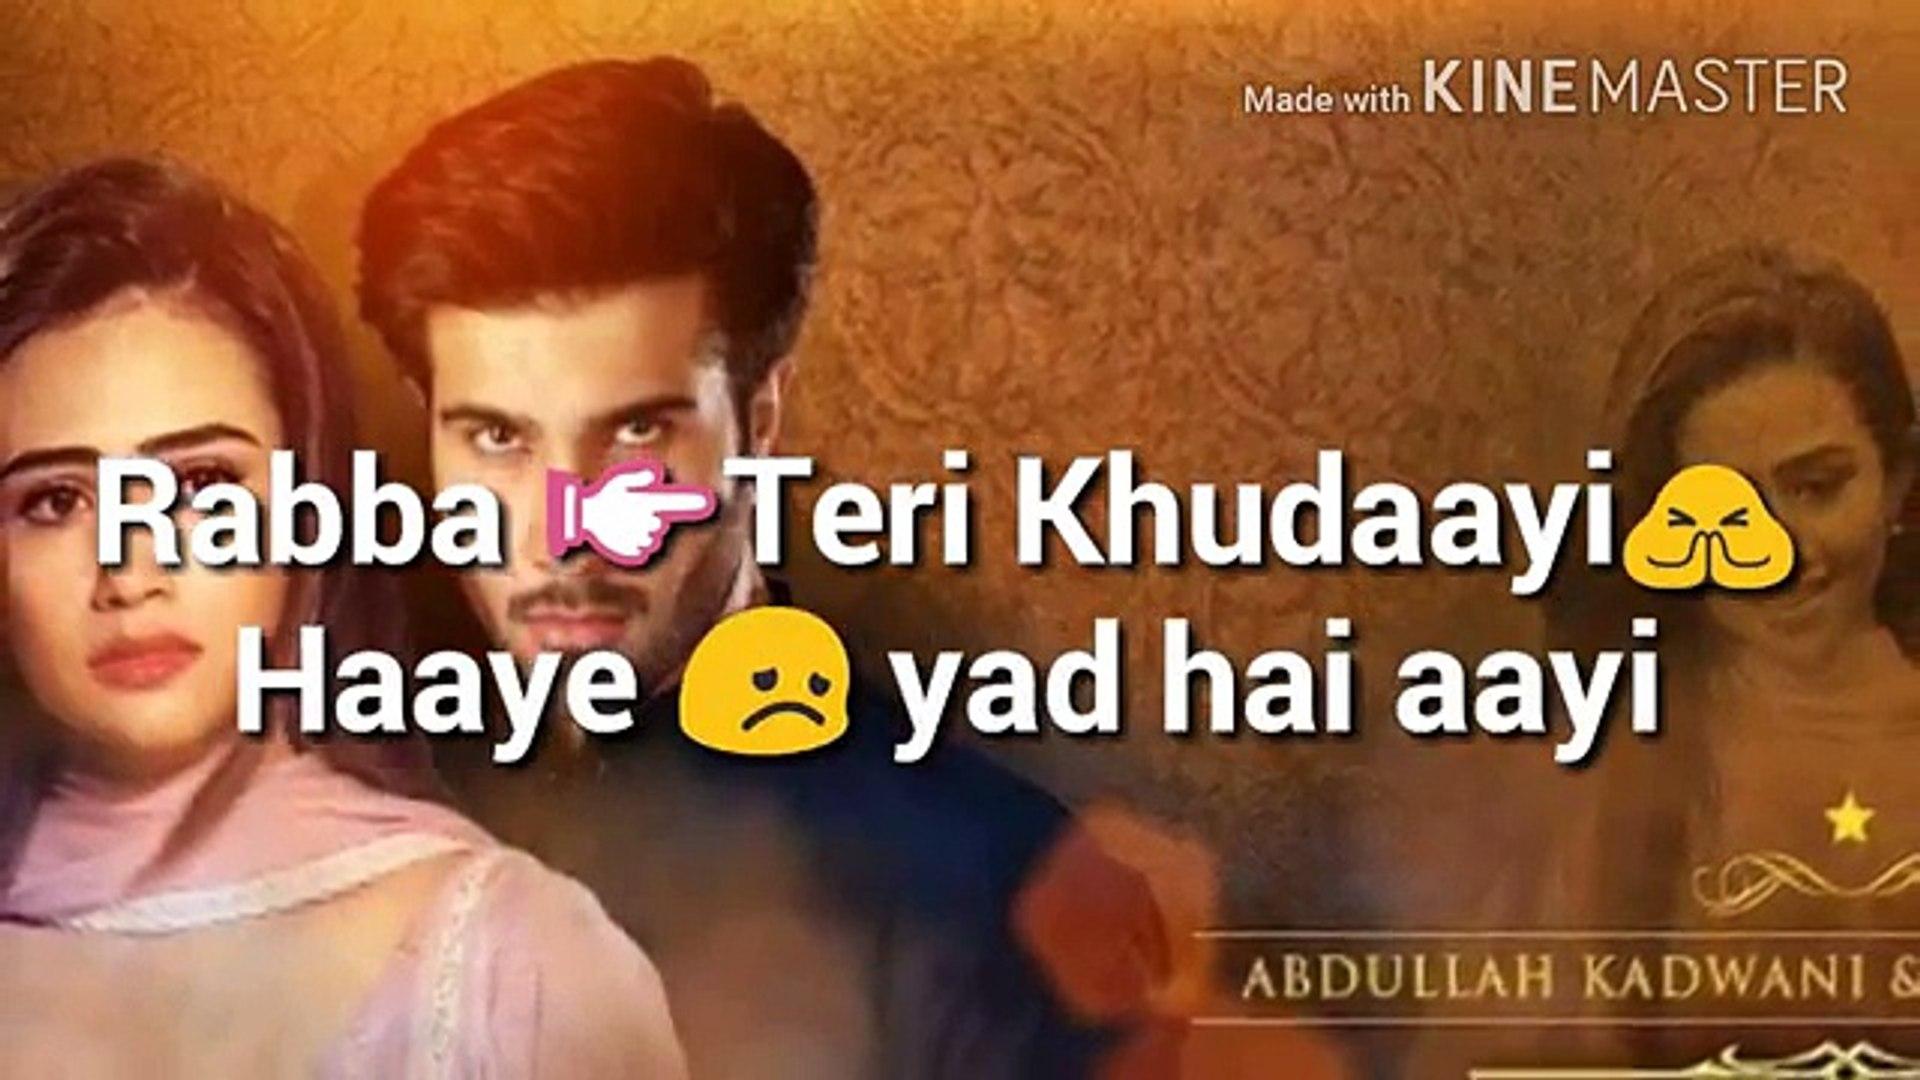 Whatsapp Status Video Khaani Ost Rahat Fateh Ali Khan Whatsapp Status Love Love Status